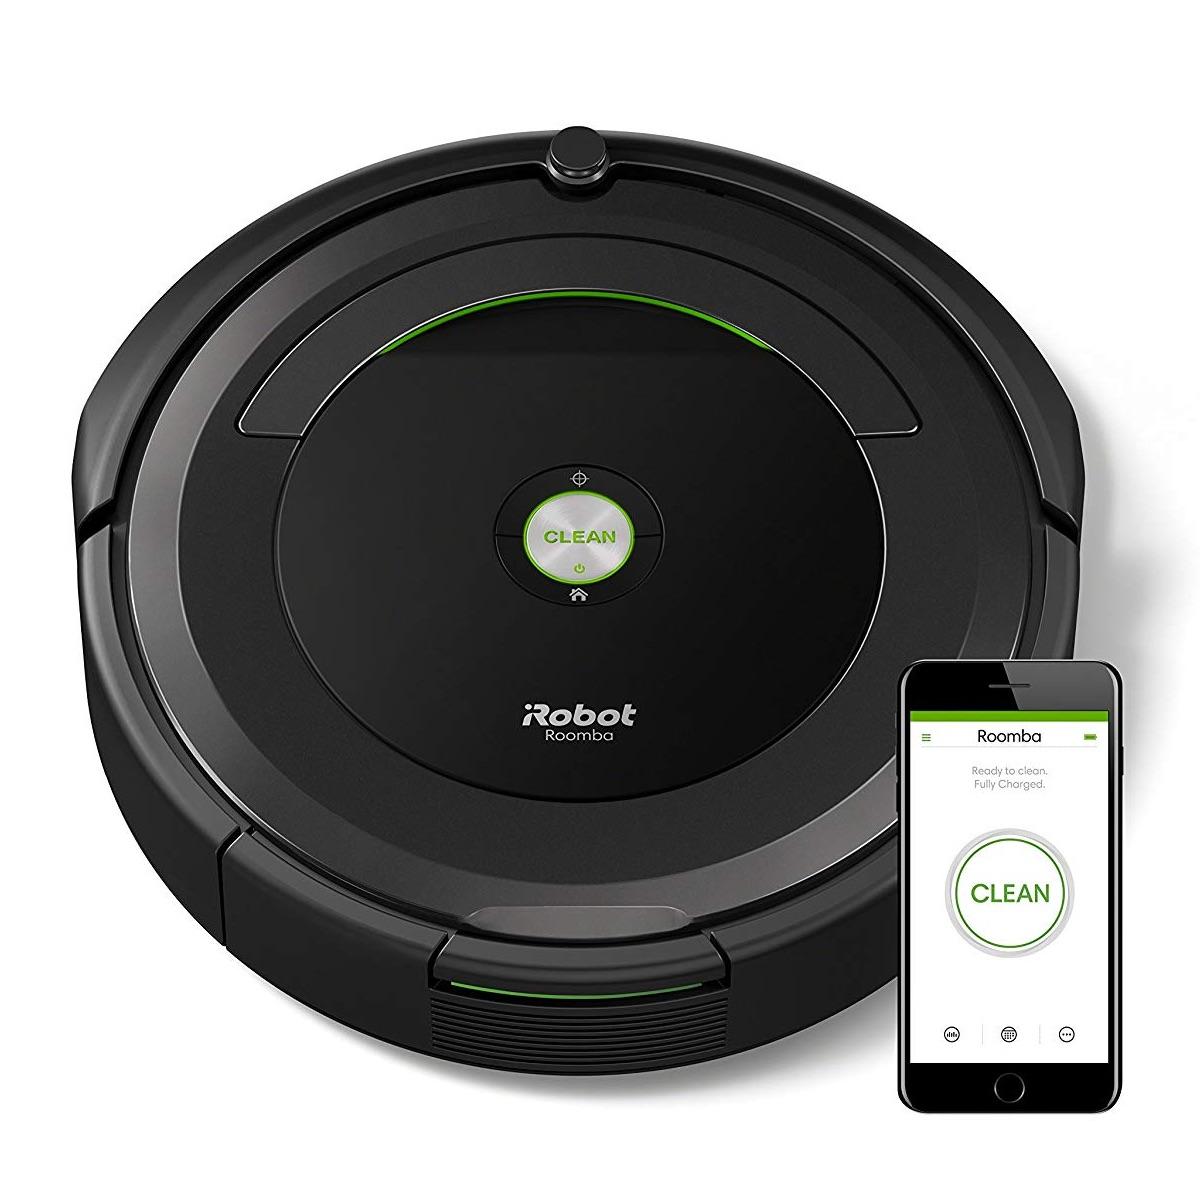 【Amazon.co.jp限定】iRobot ロボット掃除機 ルンバ 691